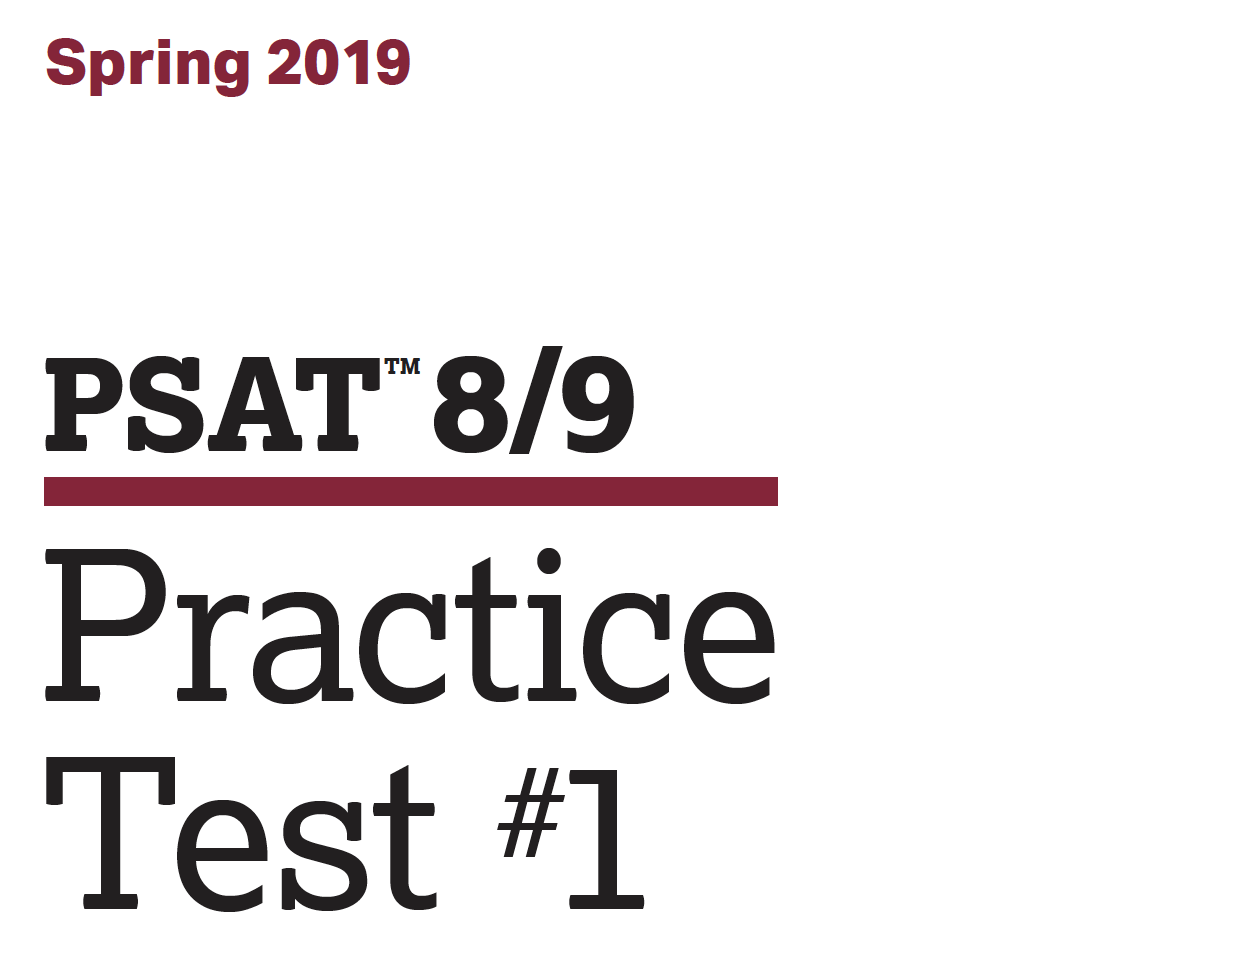 Spring 2019 PSAT 8-9 Test